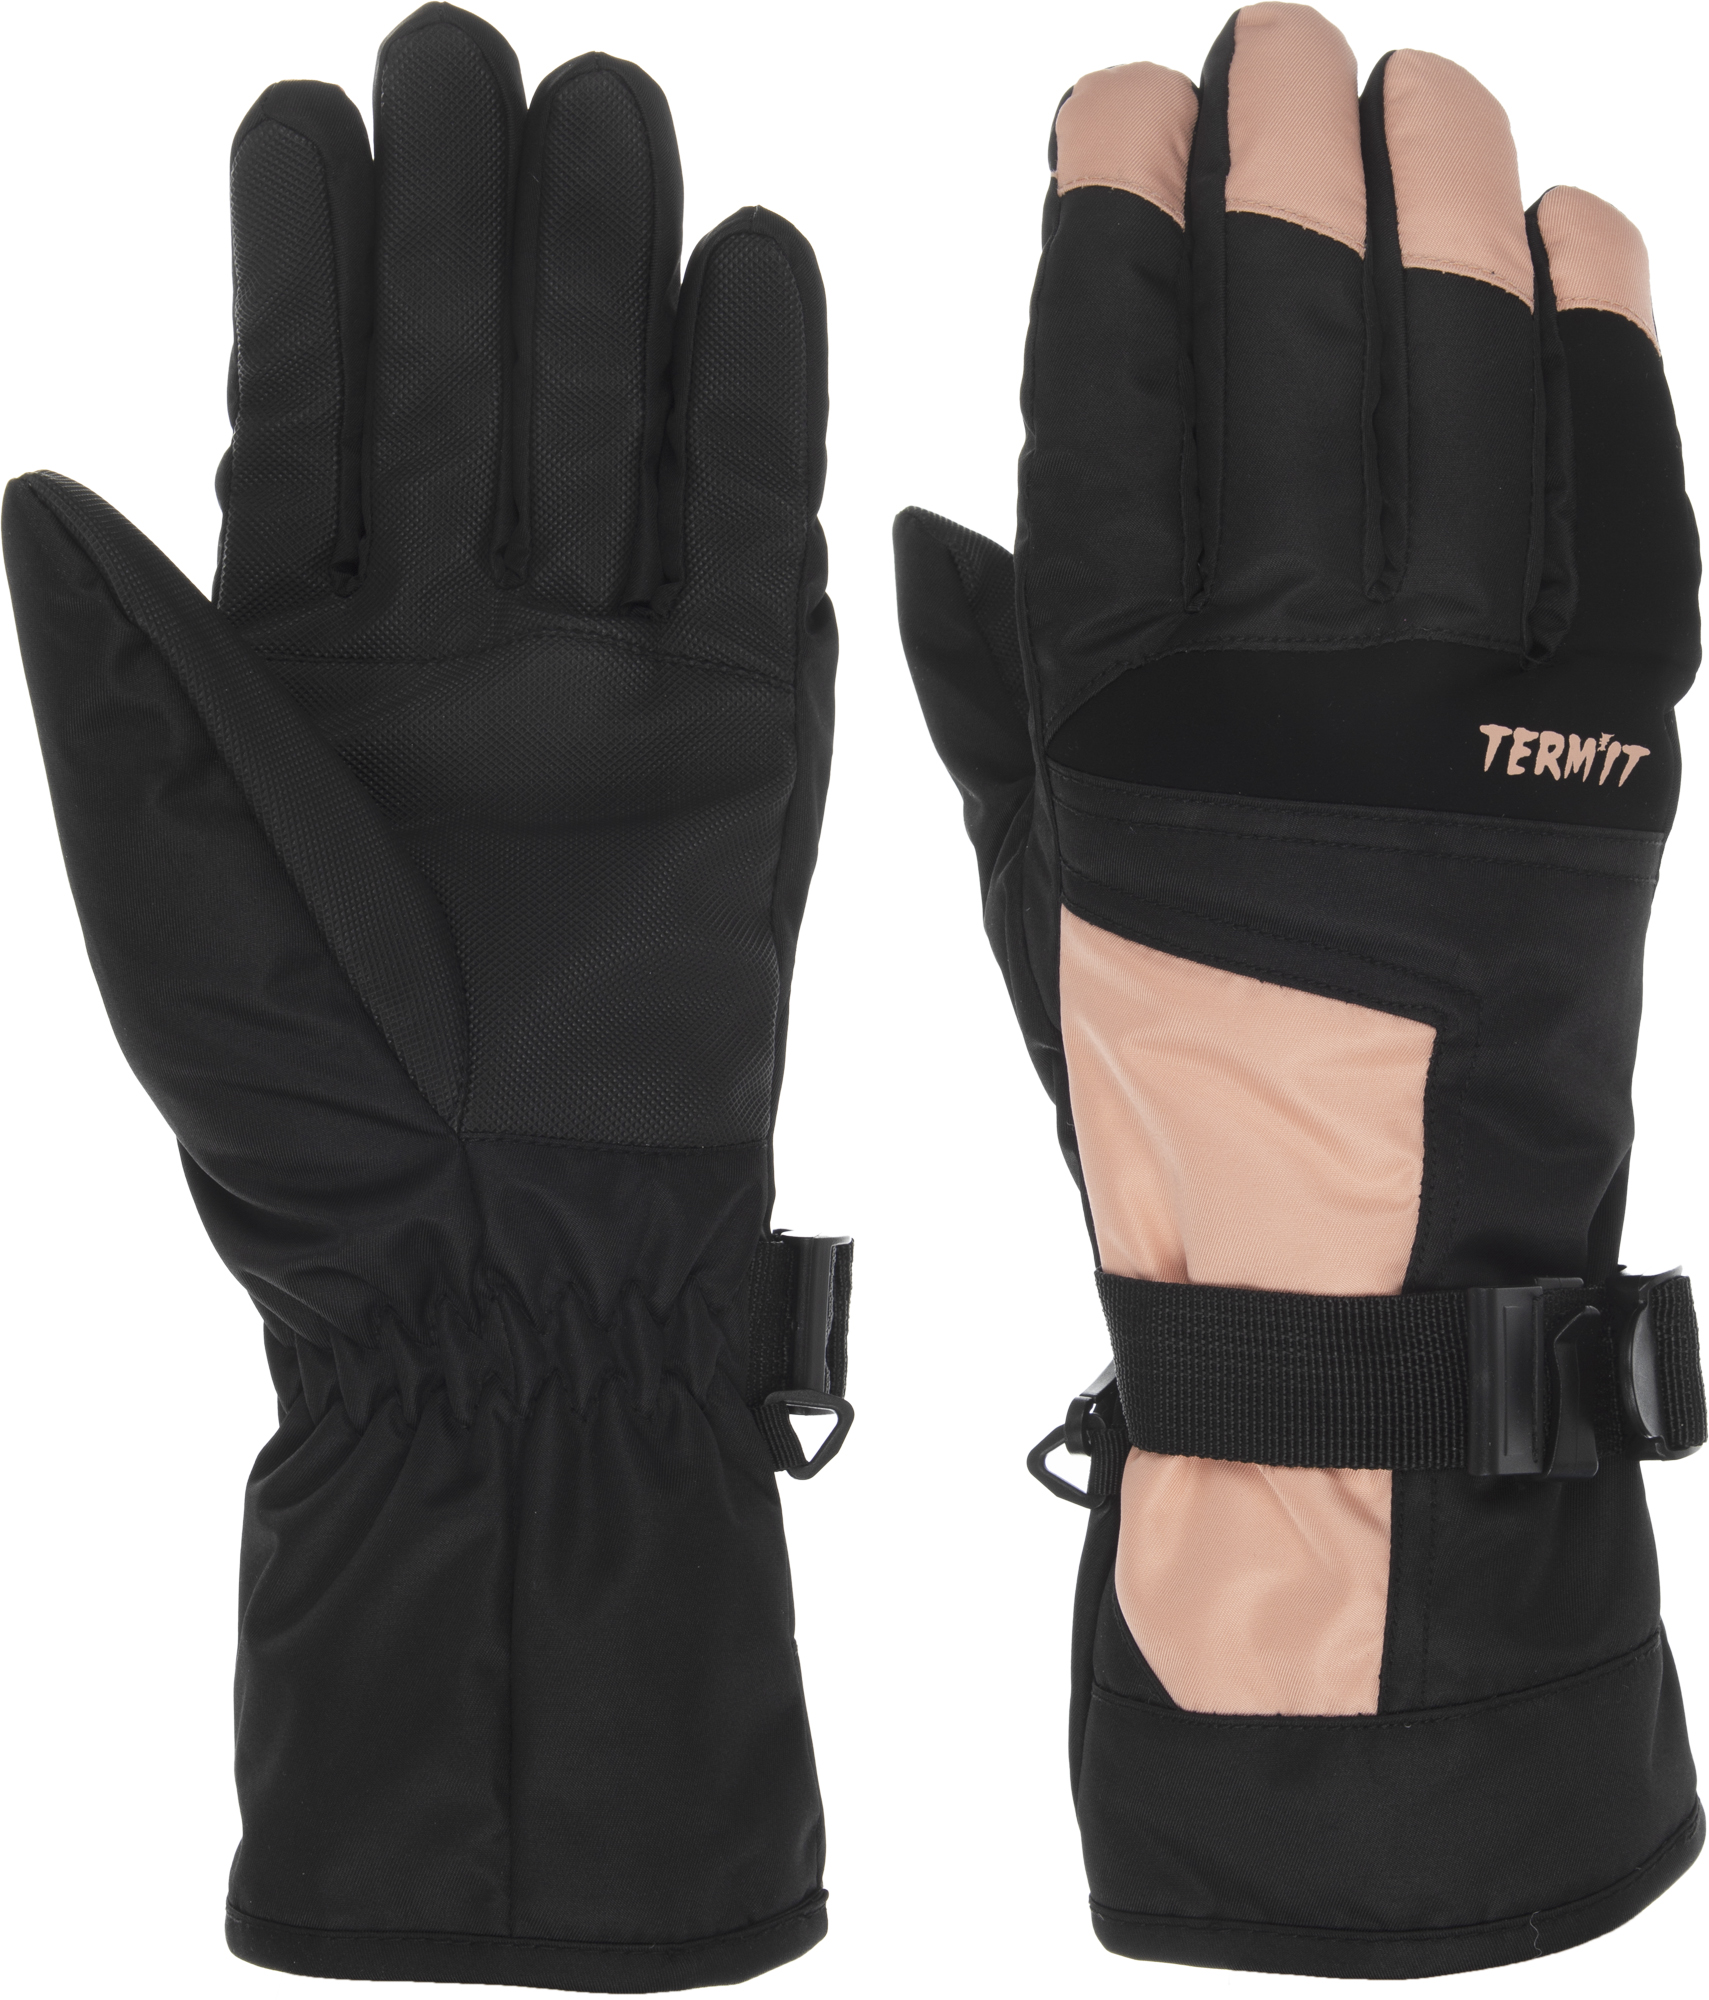 Фото - Termit Перчатки женские Termit, размер 8 перчатки женские moltini цвет черный 260b 111716 размер 8